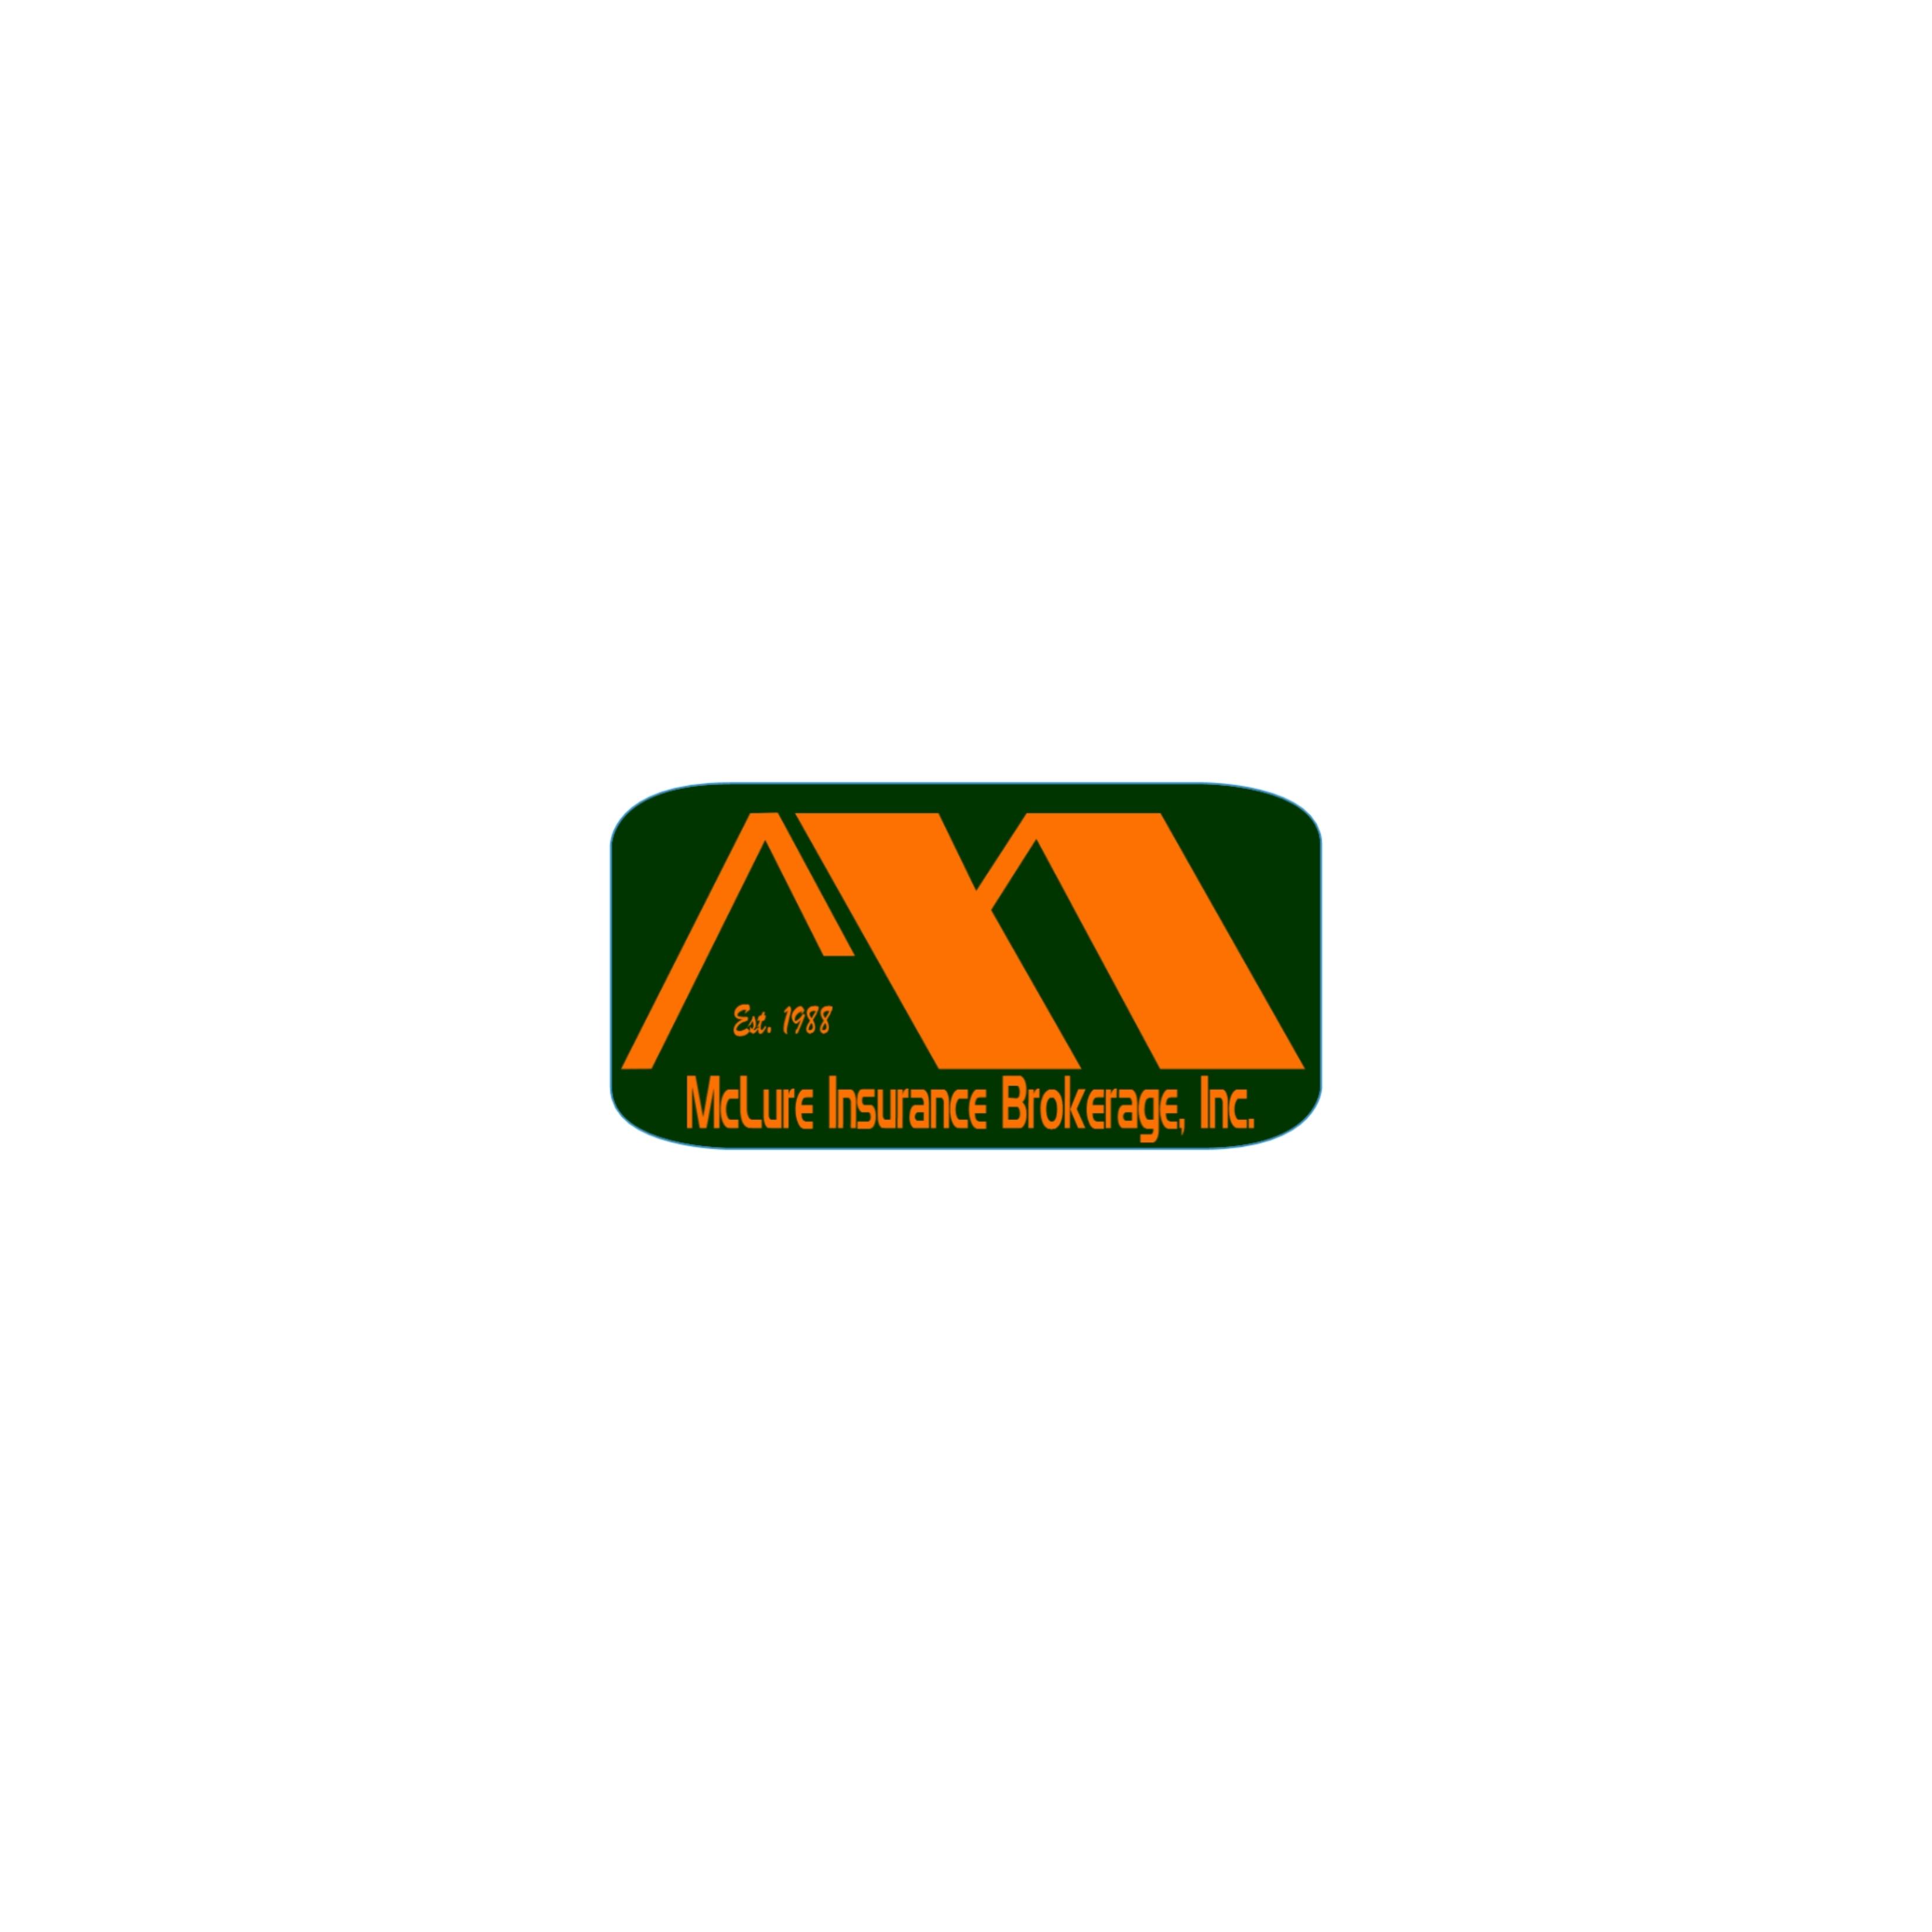 Mclure Insurance Brokerage